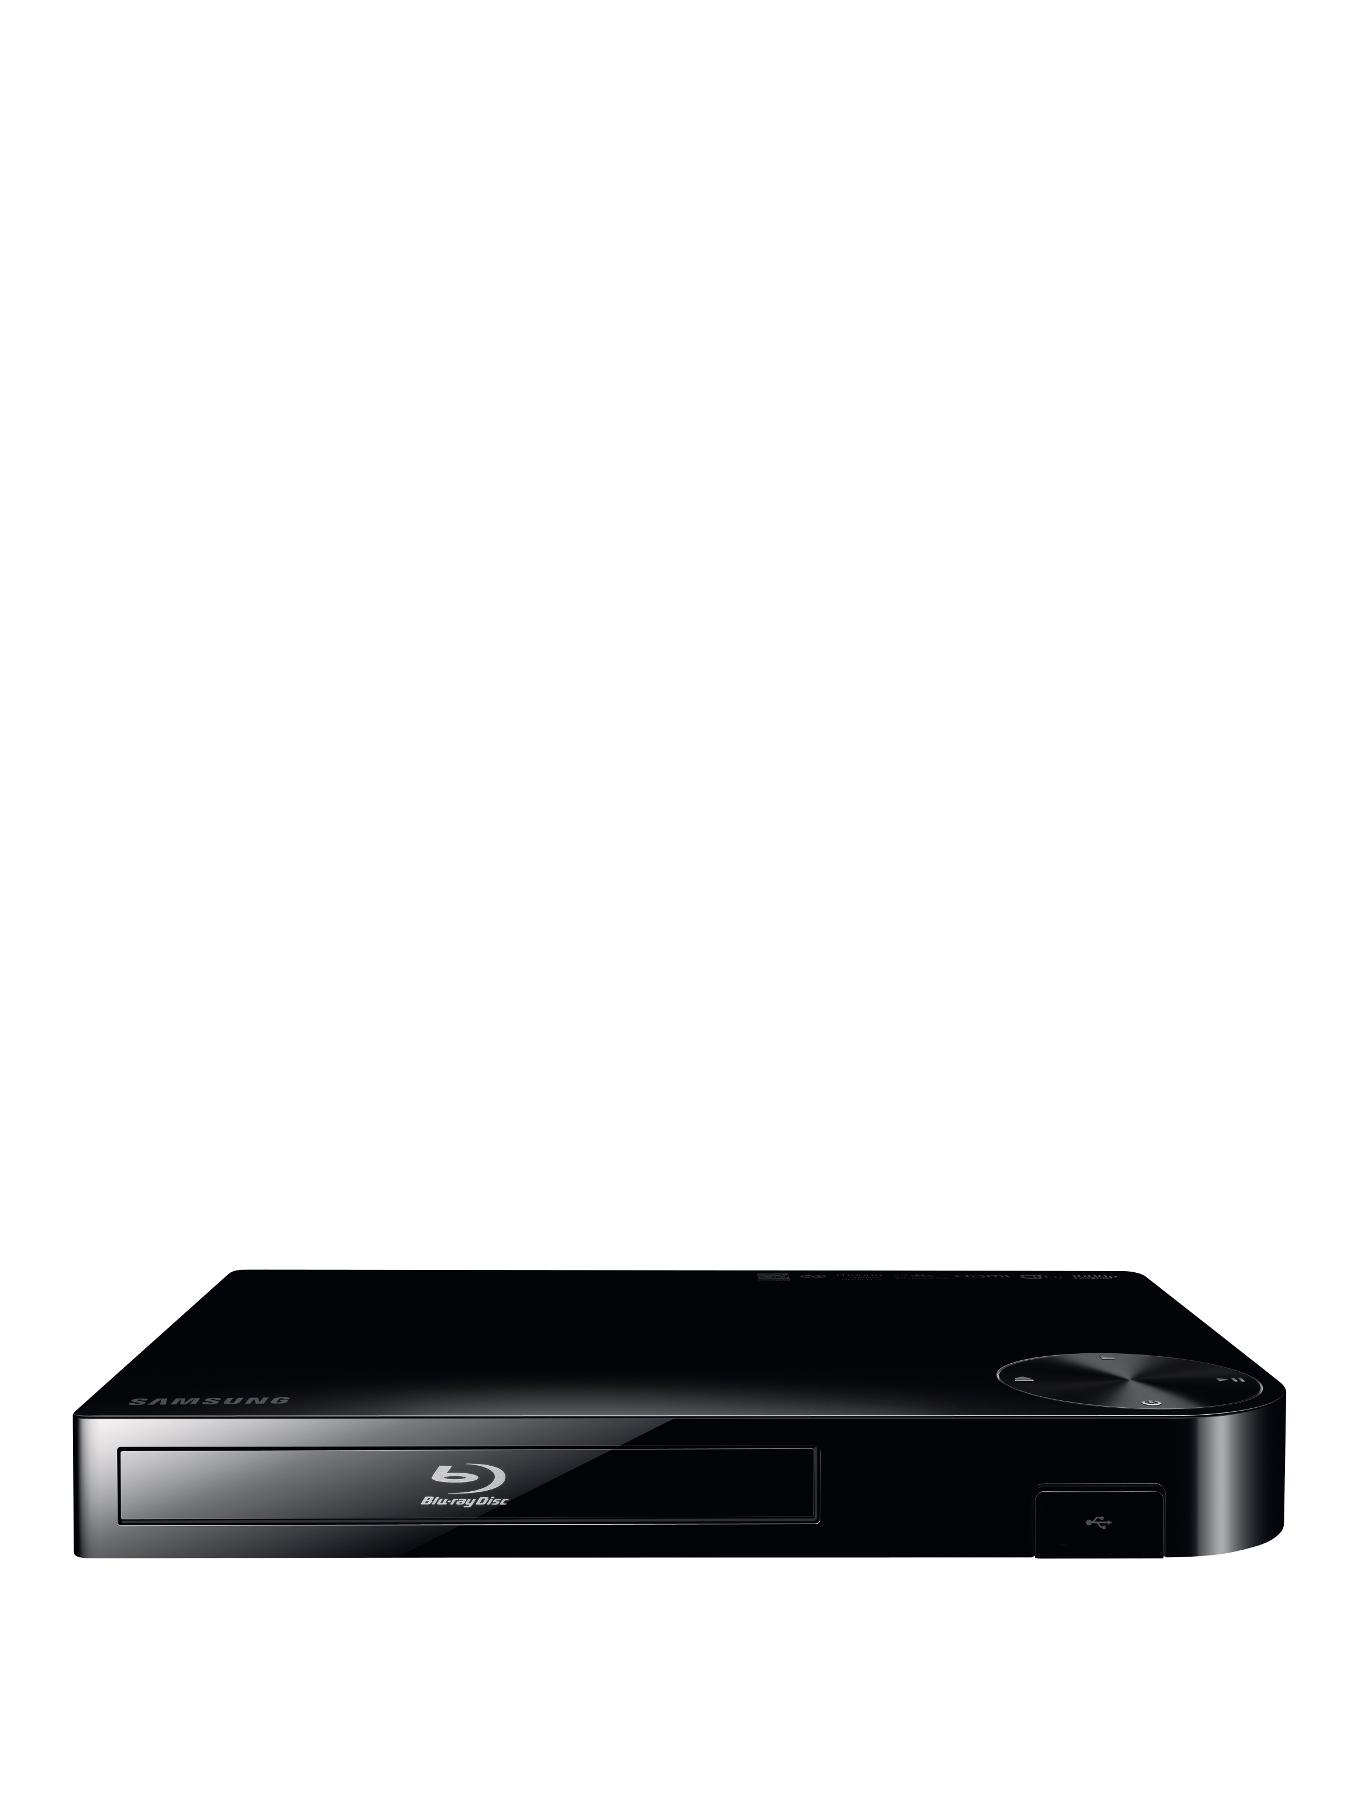 BD-F5100 Smart Blu-ray Player